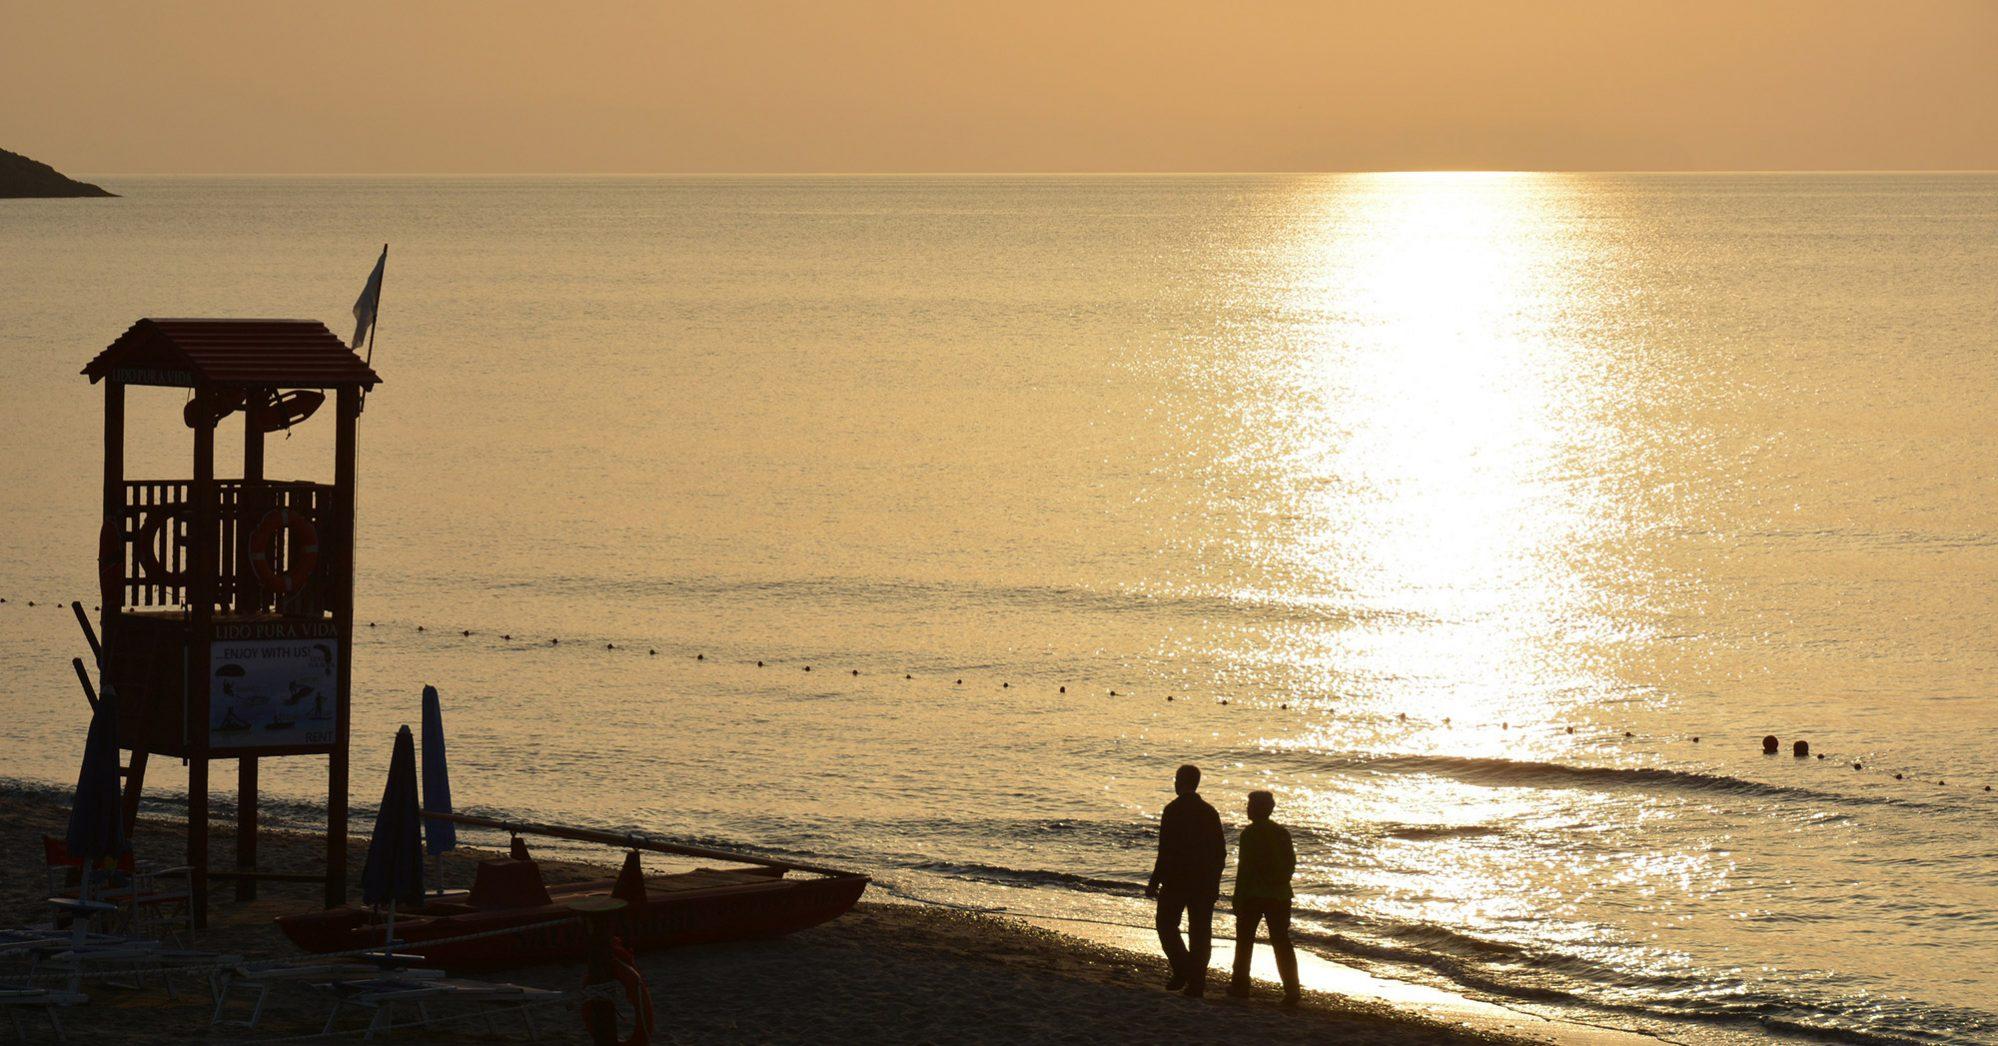 cefalu-lungomare-spiaggia-tramonto-sunset-featured